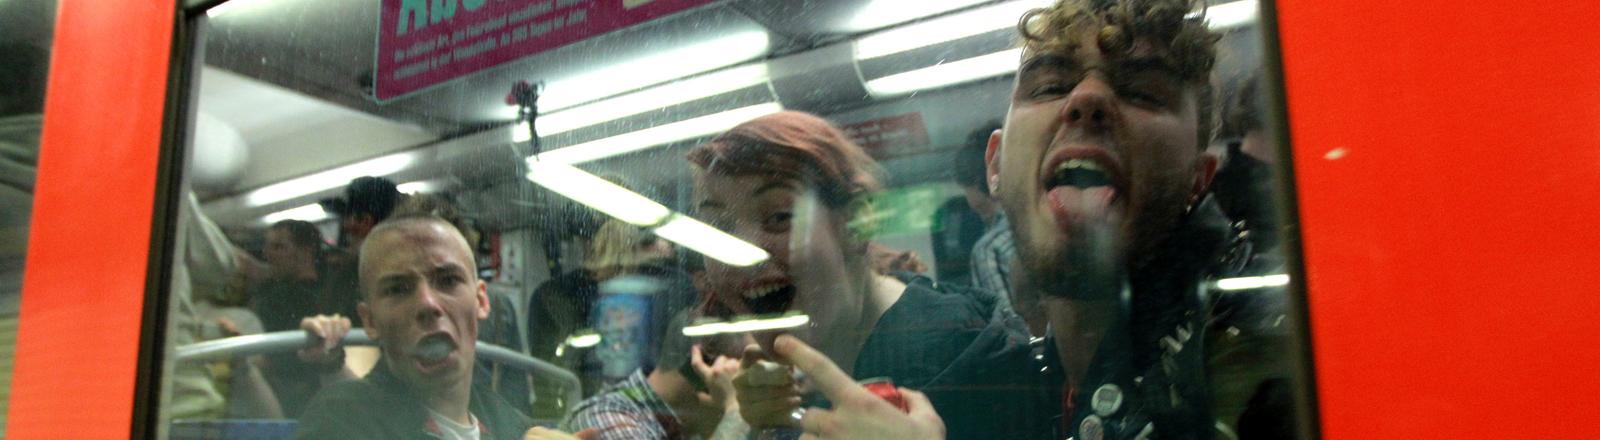 Betrunkene in einer Bahn.